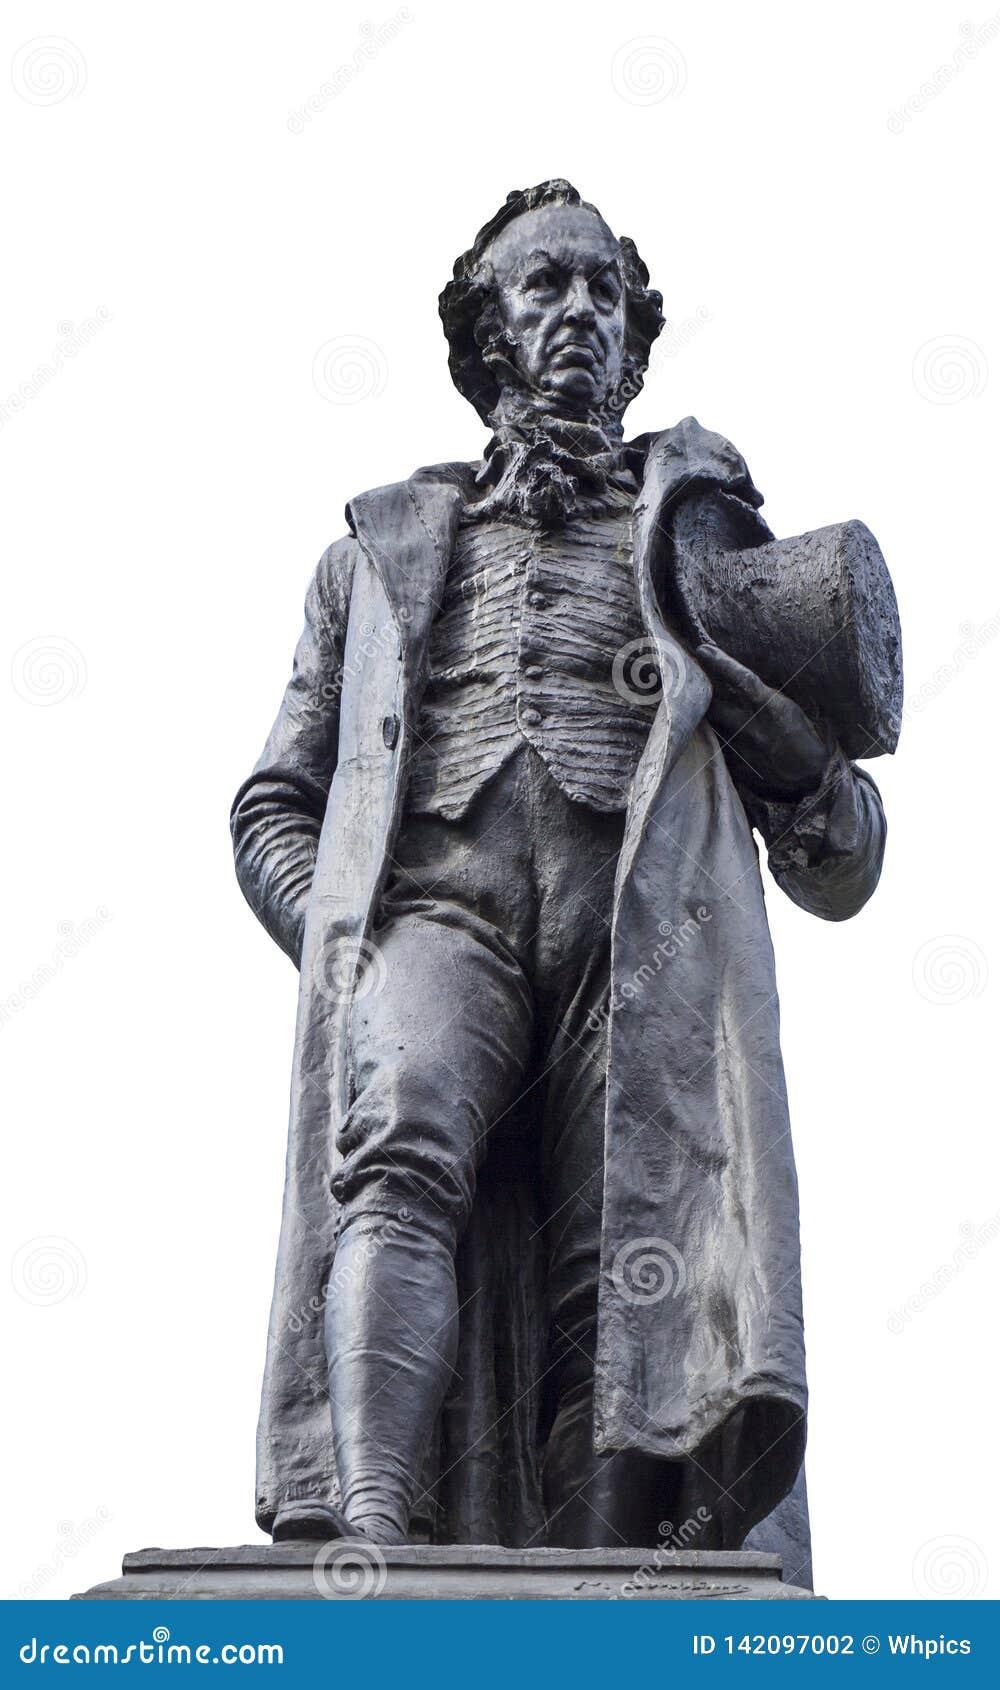 Bronze statue of Francisco de Goya